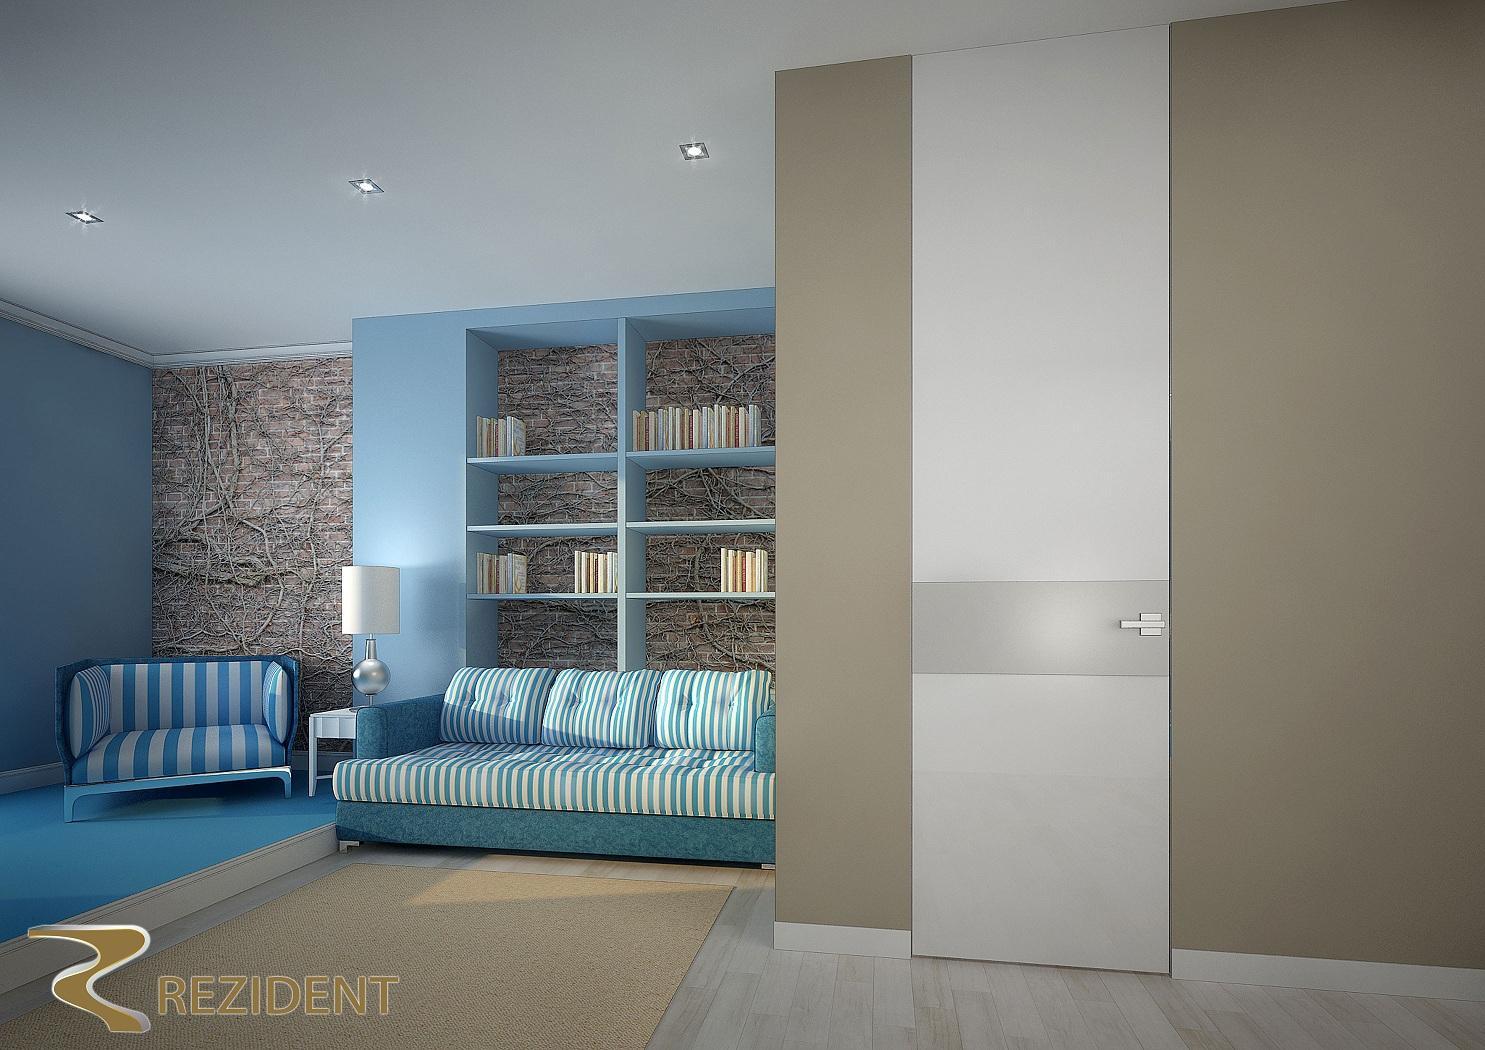 "RT @RezidentMoscow: #Модные двери- #высокиеДвери. Новые модели Rezident - высоко и ""без коробки"" #СкрытыеКоробки #интерьер http://t.co/94K4ZsWZLB"